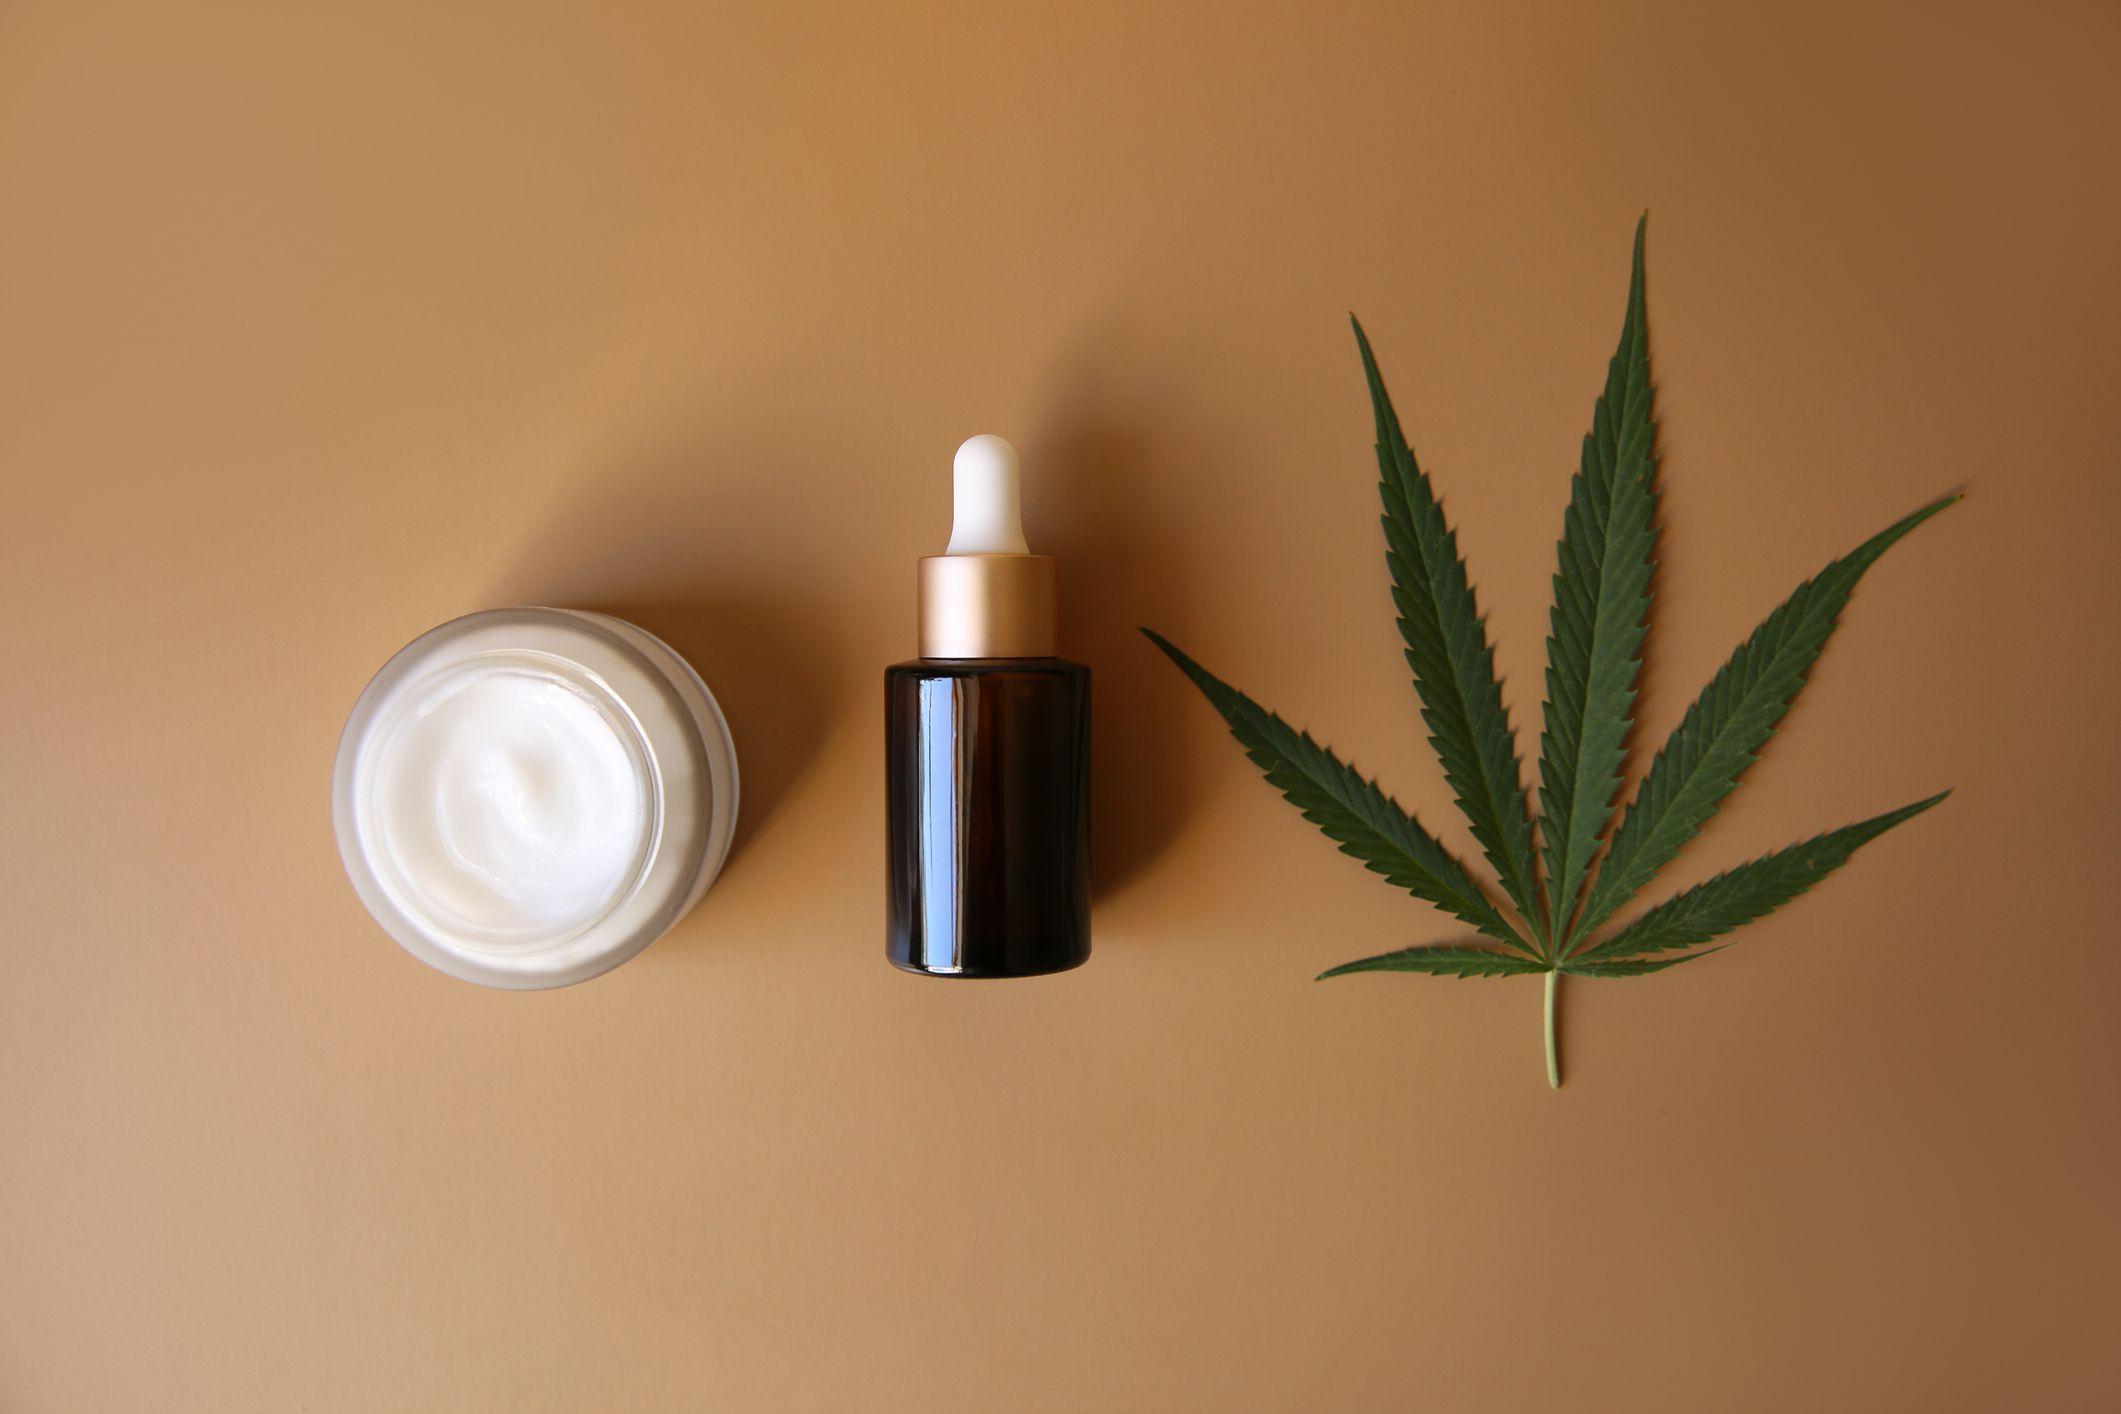 medicinal cream with CBD oil, bottle of cannabis oil, capsule